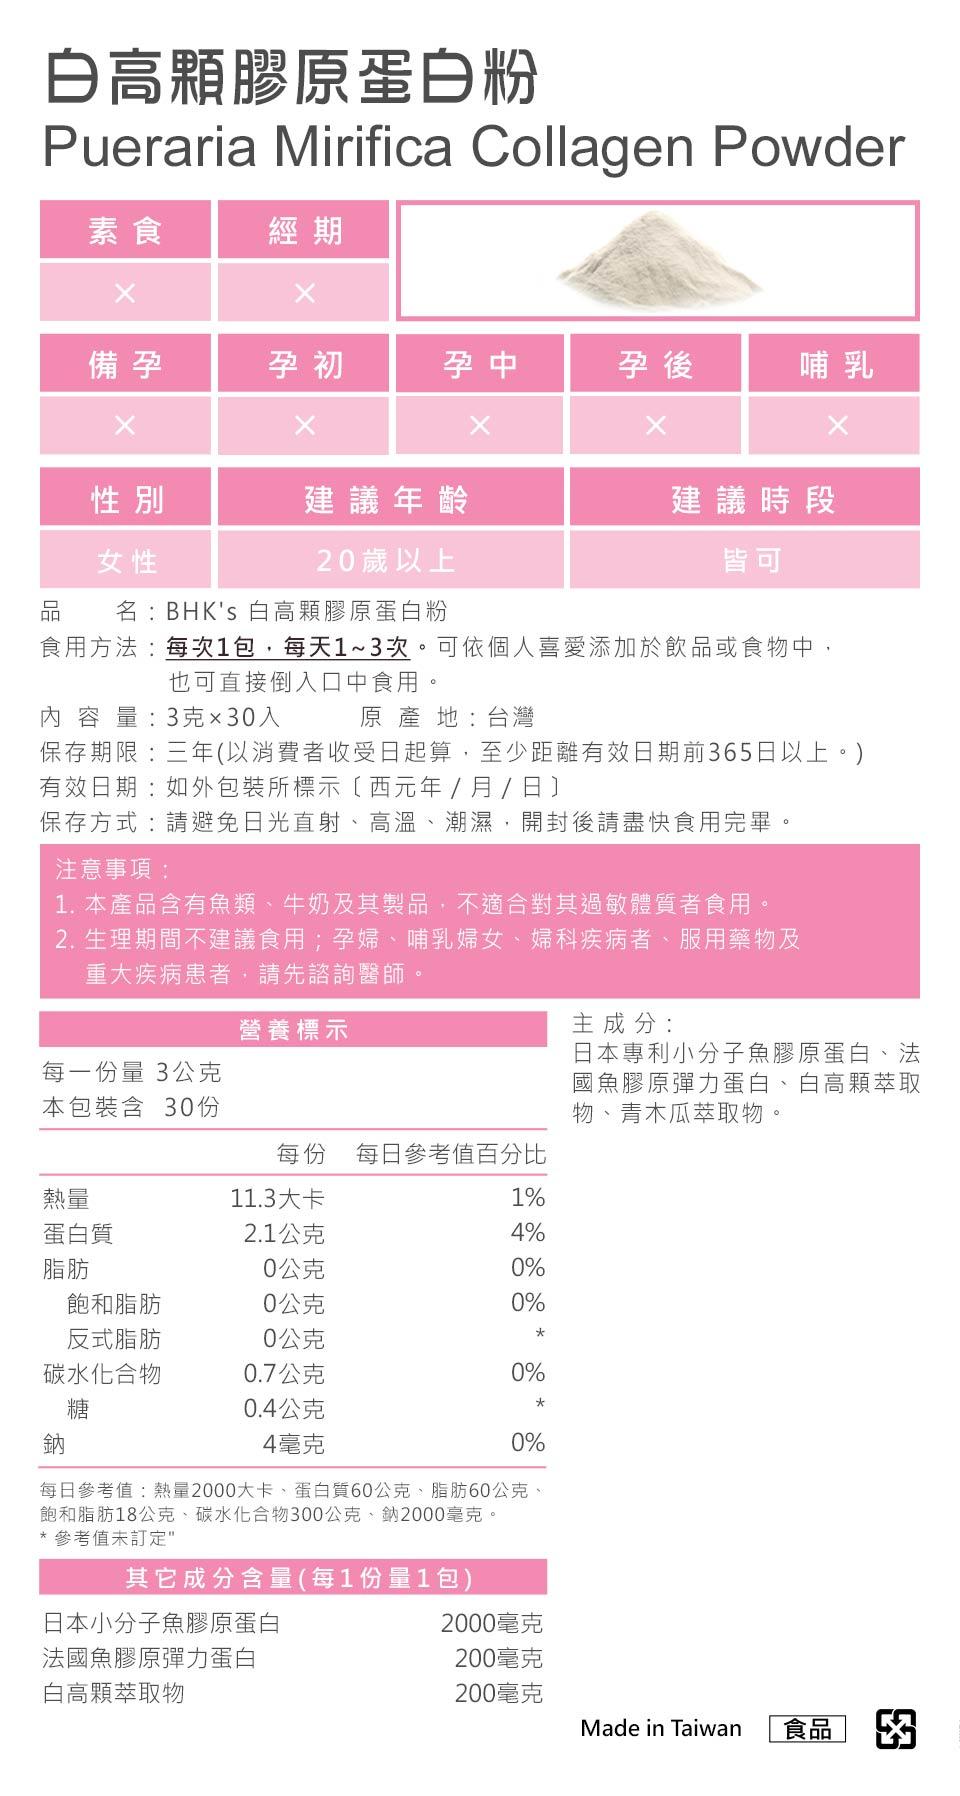 BHK白高顆膠原蛋白粉,專業把關,產品皆經安全檢驗合格,台灣生產製造,最安心放心的美胸食品。